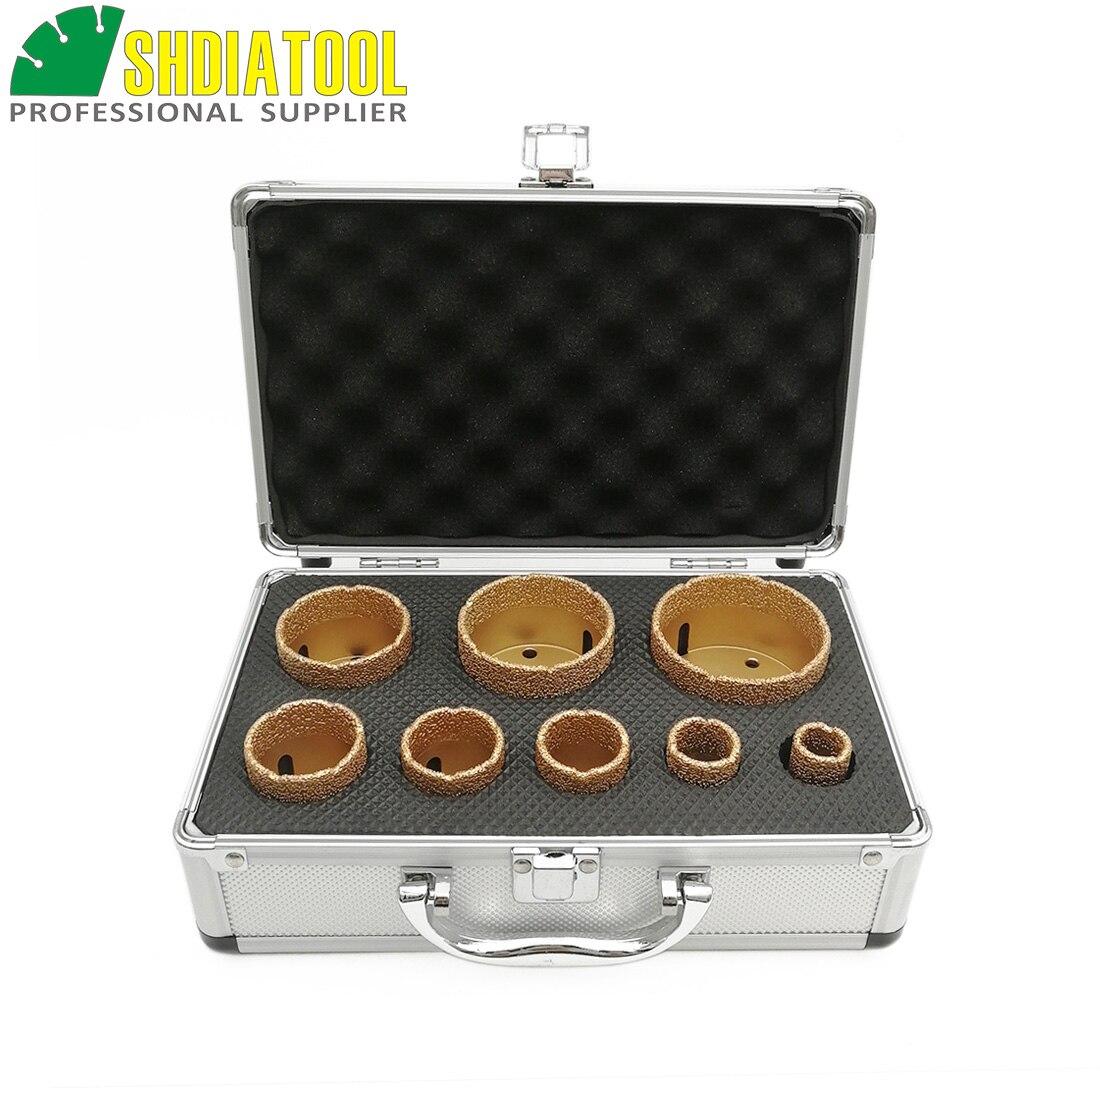 SHDIATOOL 1set M14 Vacuum Brazed Diamond Drill Core Bits With Box Dia 20+25+32+35+40+50+60+68mm Granite Marble Ceramic Hole Saw